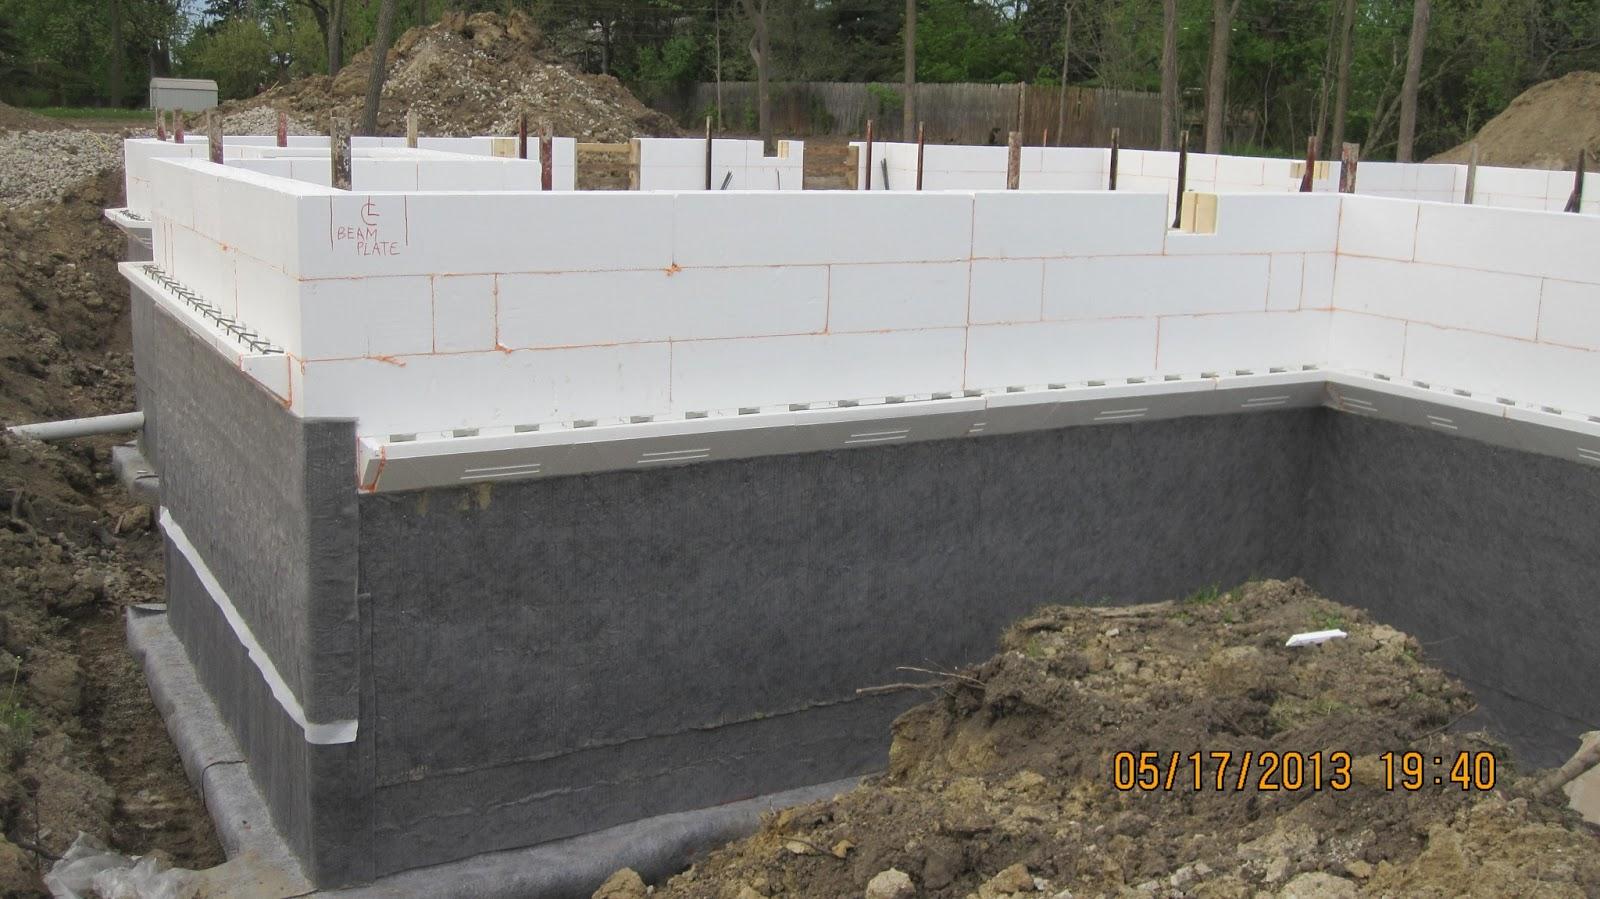 installerd on insulating concrete form icf blocks in basement